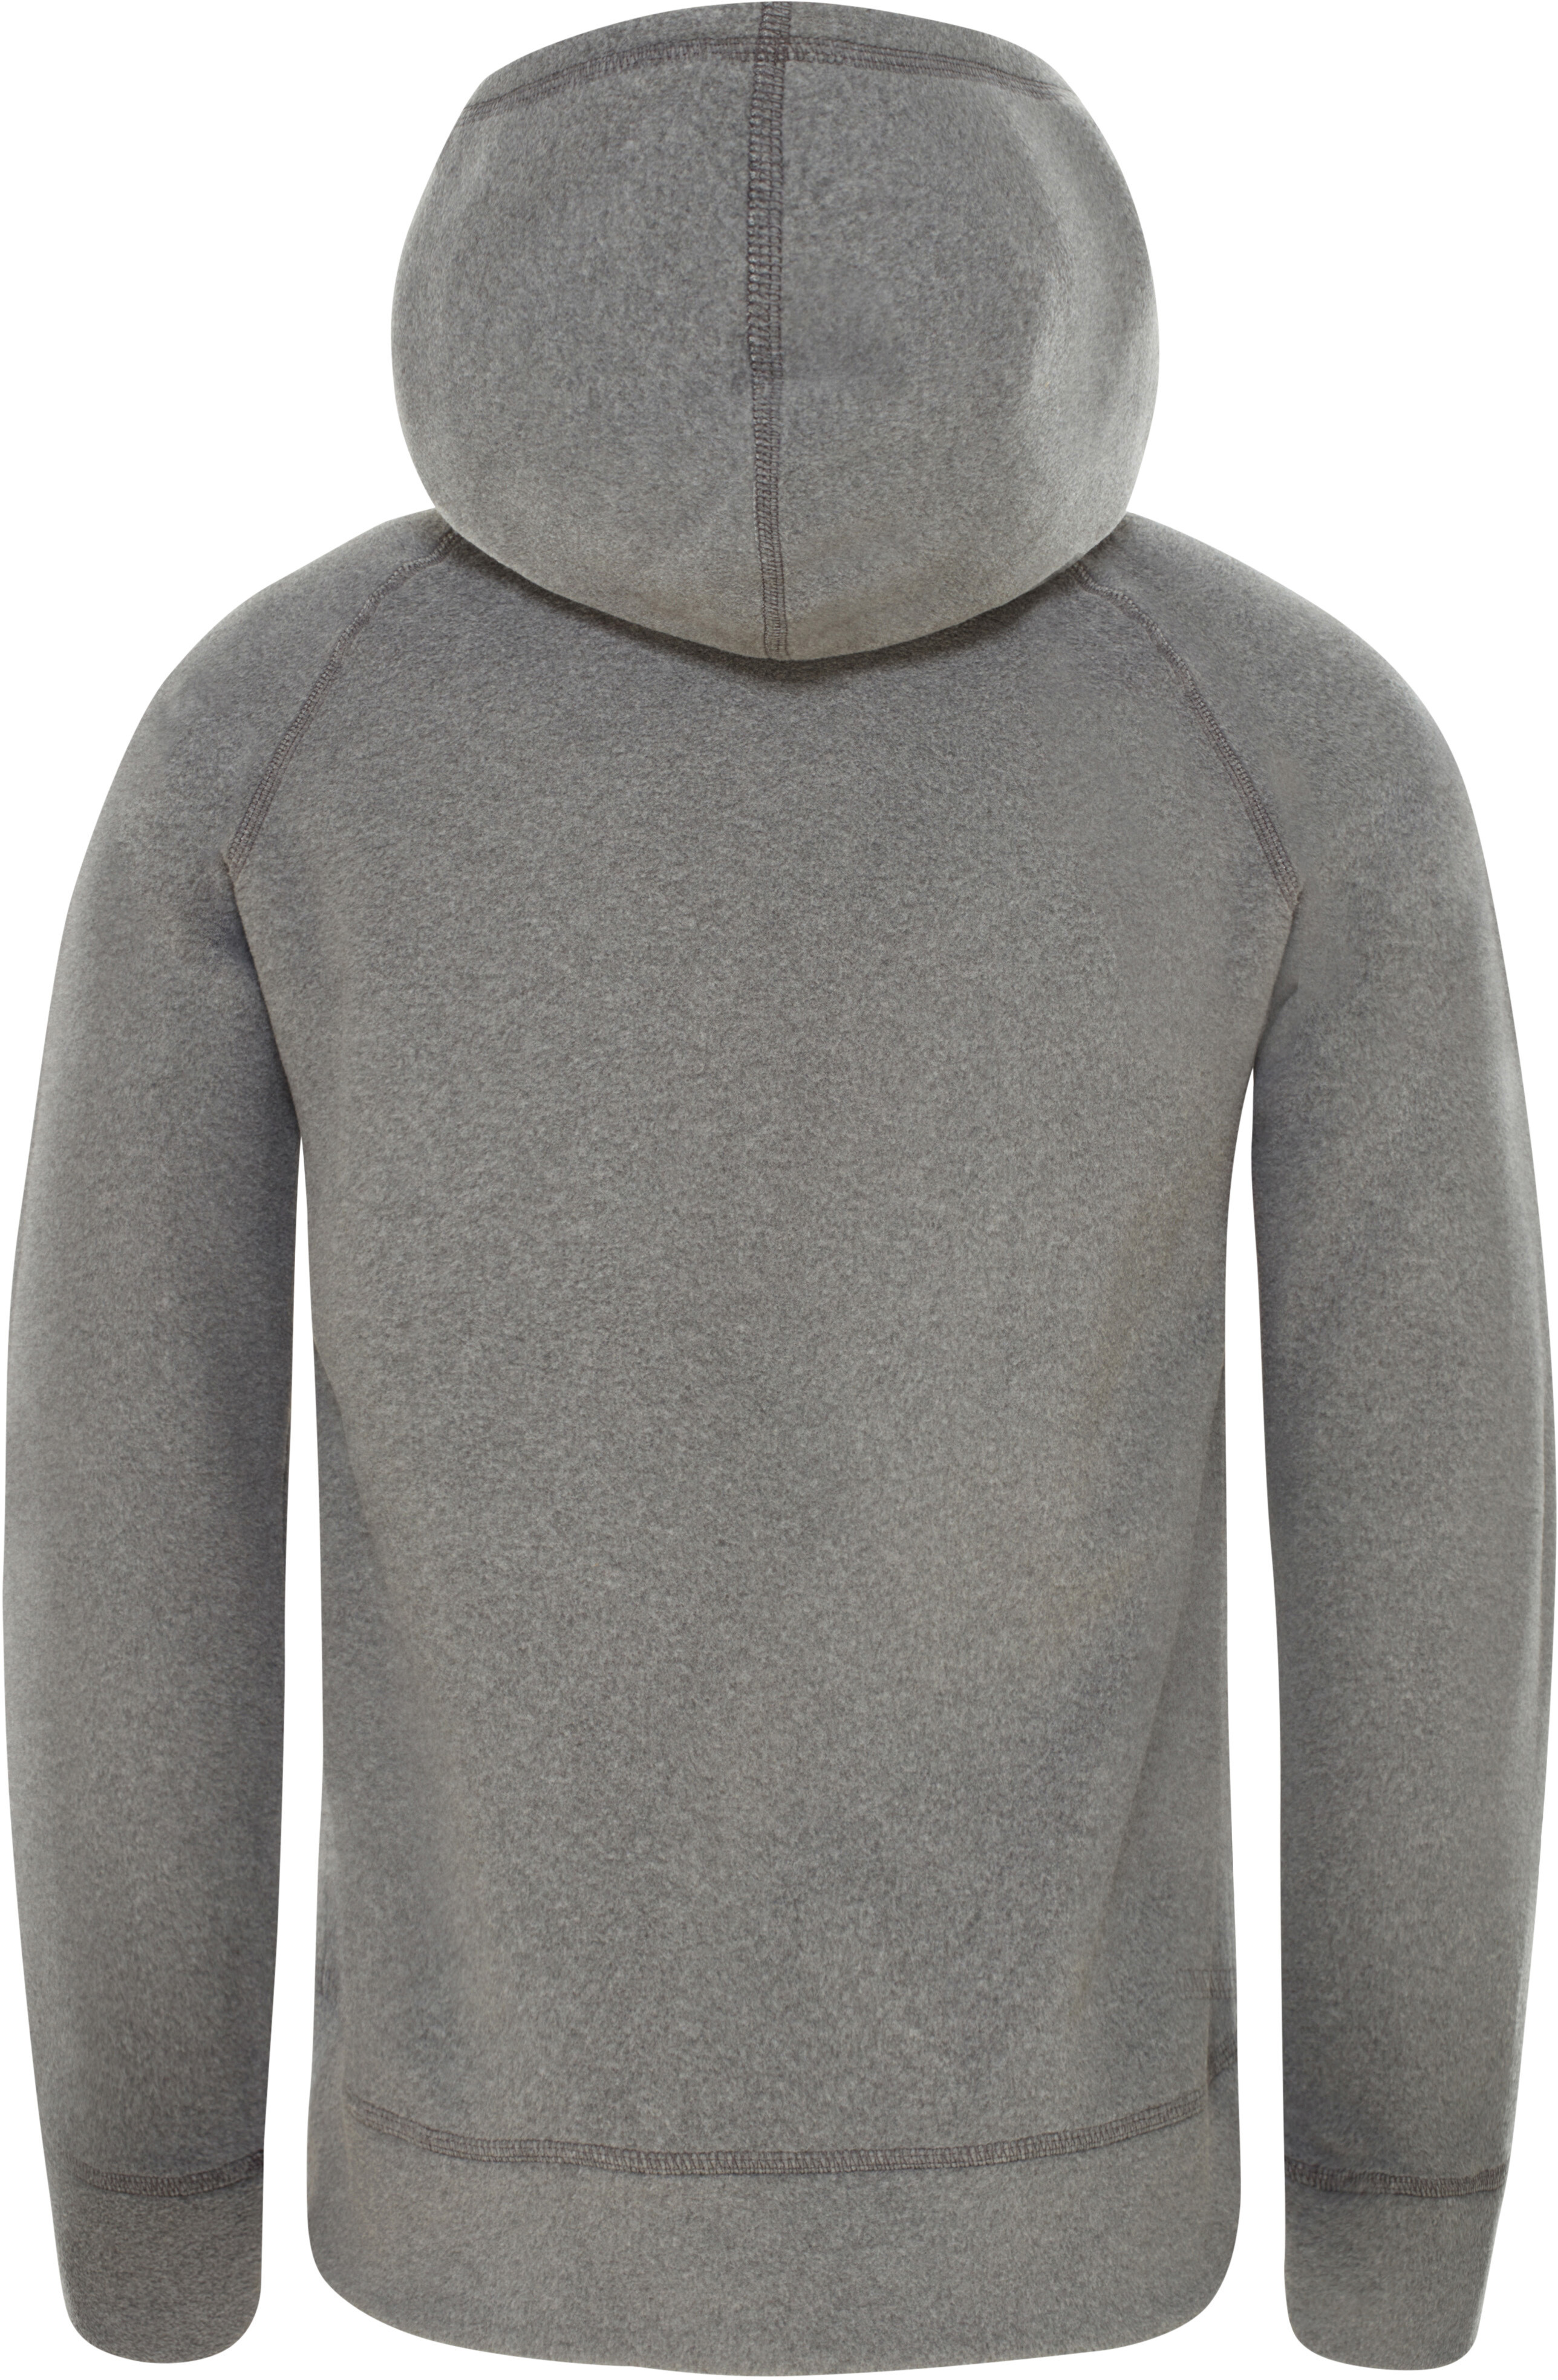 f084cfd83 The North Face Glacier Full-Zip Hoodie Boys tnf medium grey heather/graphit  grey